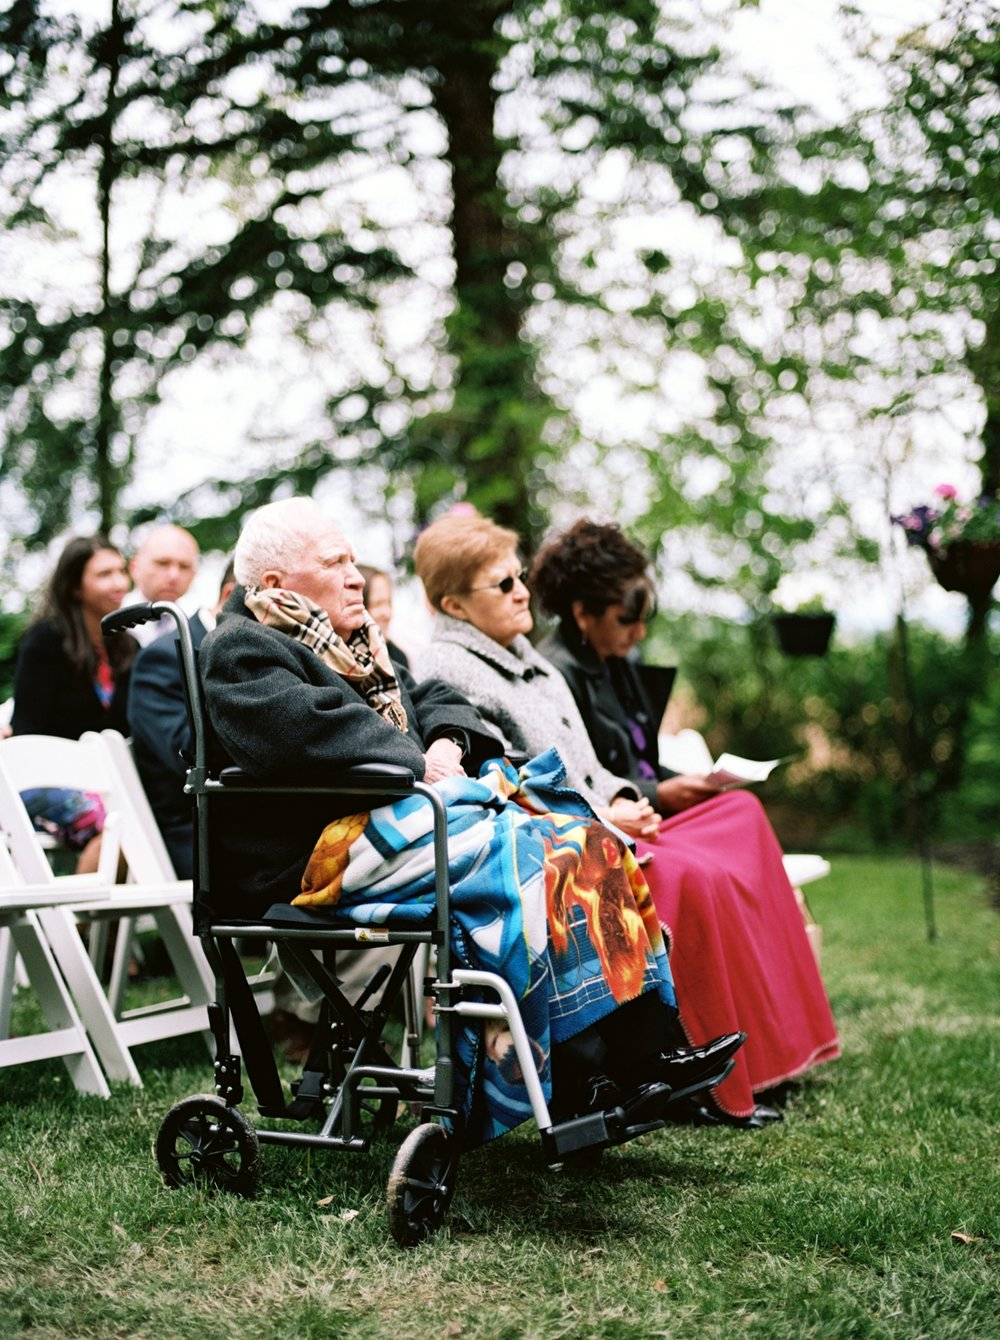 season magnolia manor wedding elisa ignacio czar goss photo 16.jpg